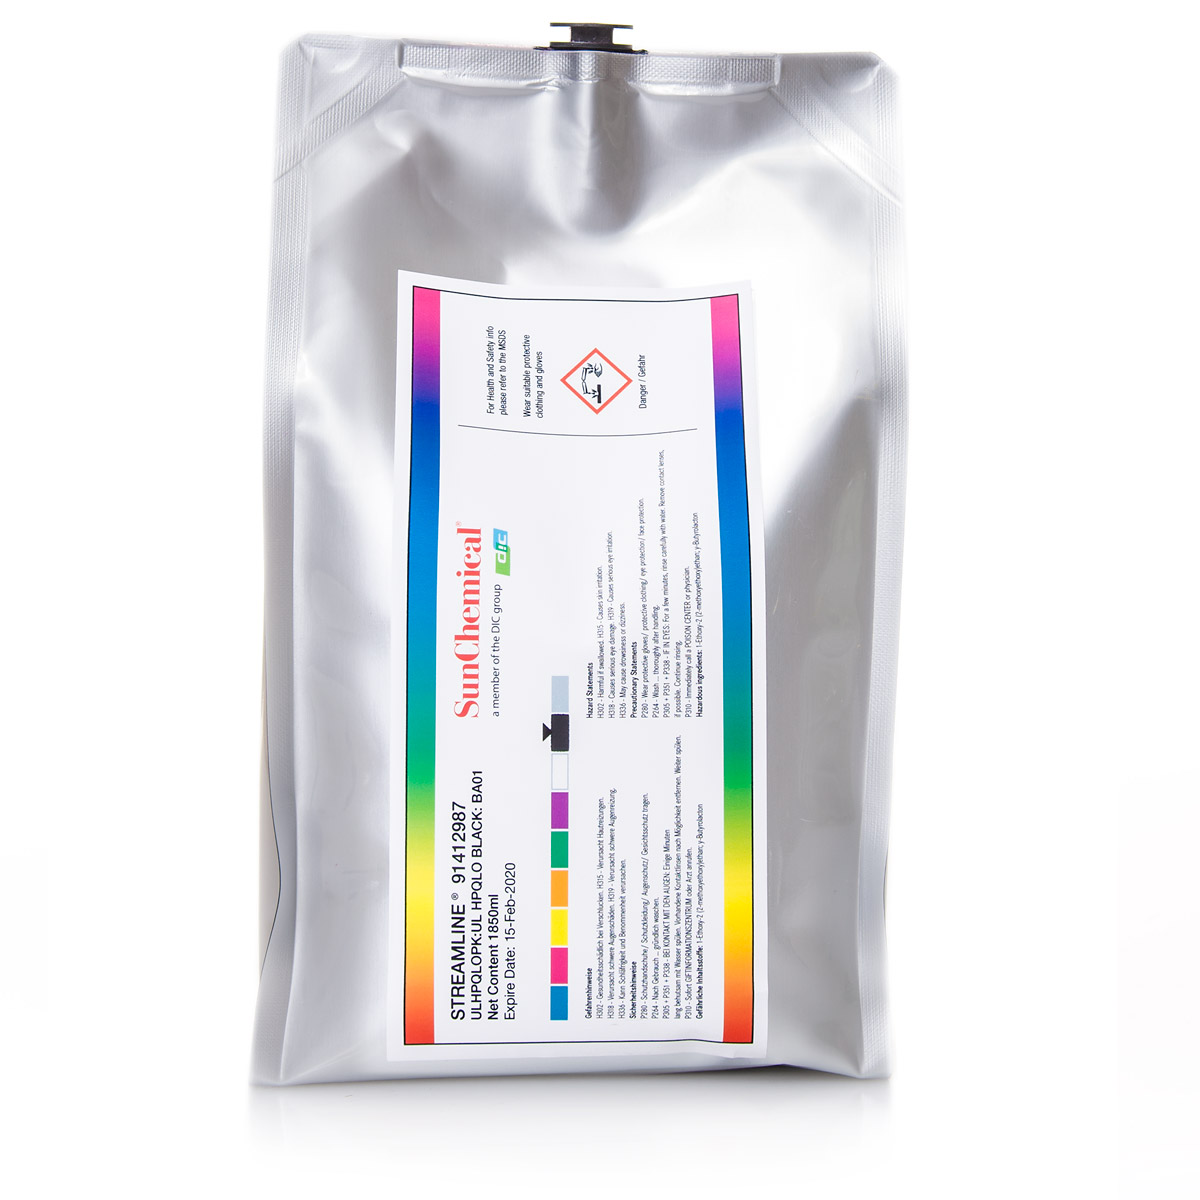 2L MBIS Tintenbeutel Streamline® Ultima HPQLO für Mimaki® SS21